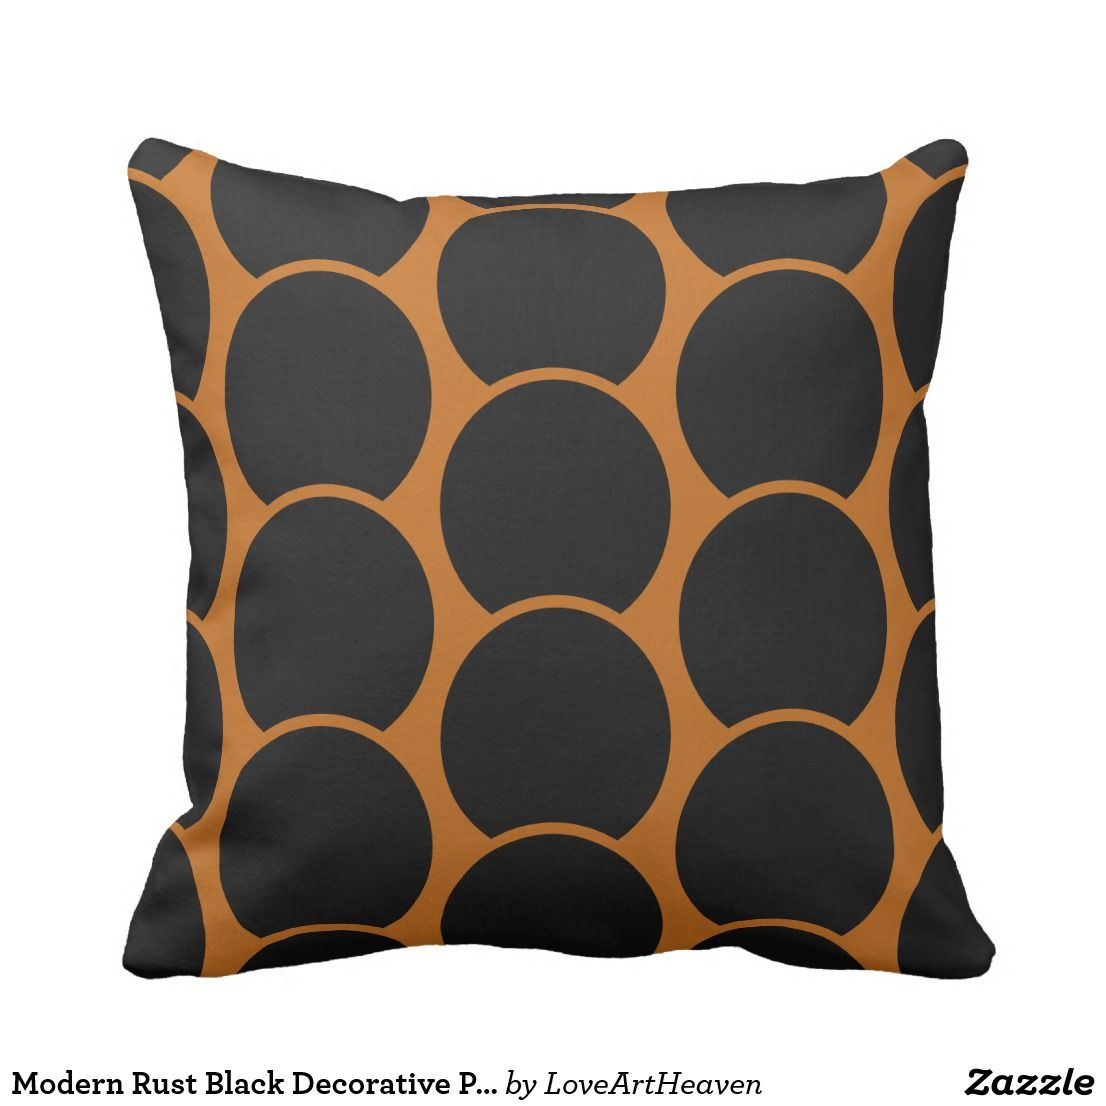 Modern Rust Black Decorative Pillow Zazzle Com Black